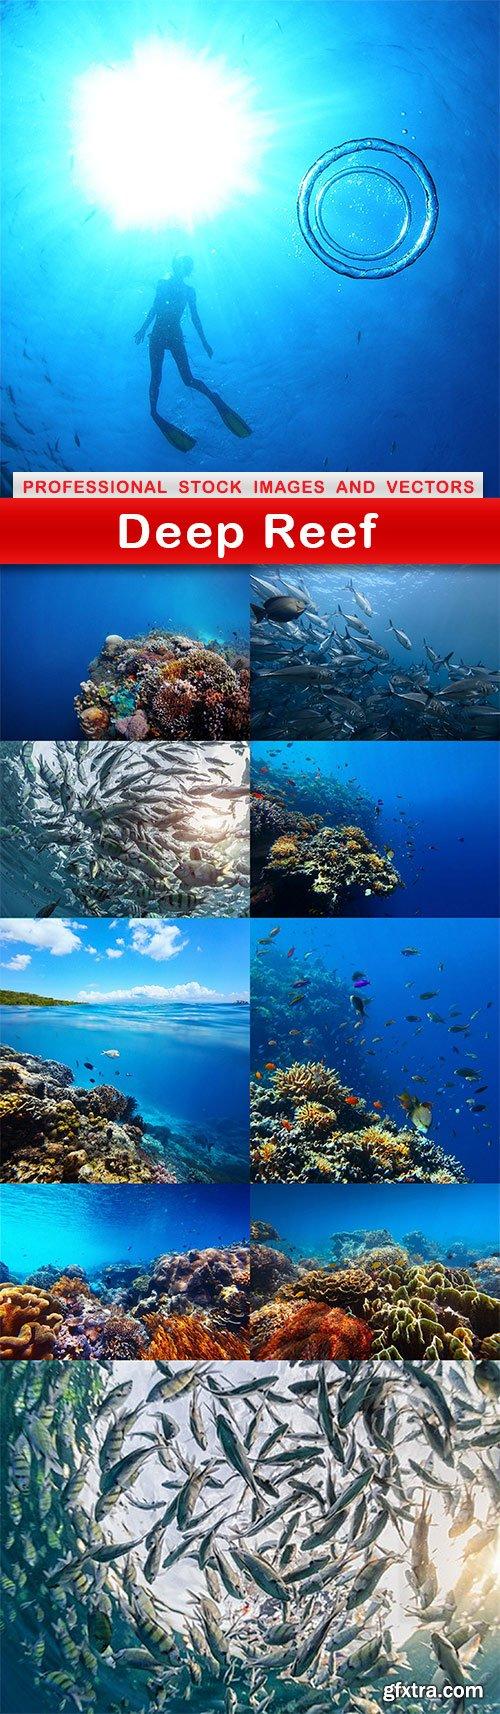 Deep Reef - 10 UHQ JPEG